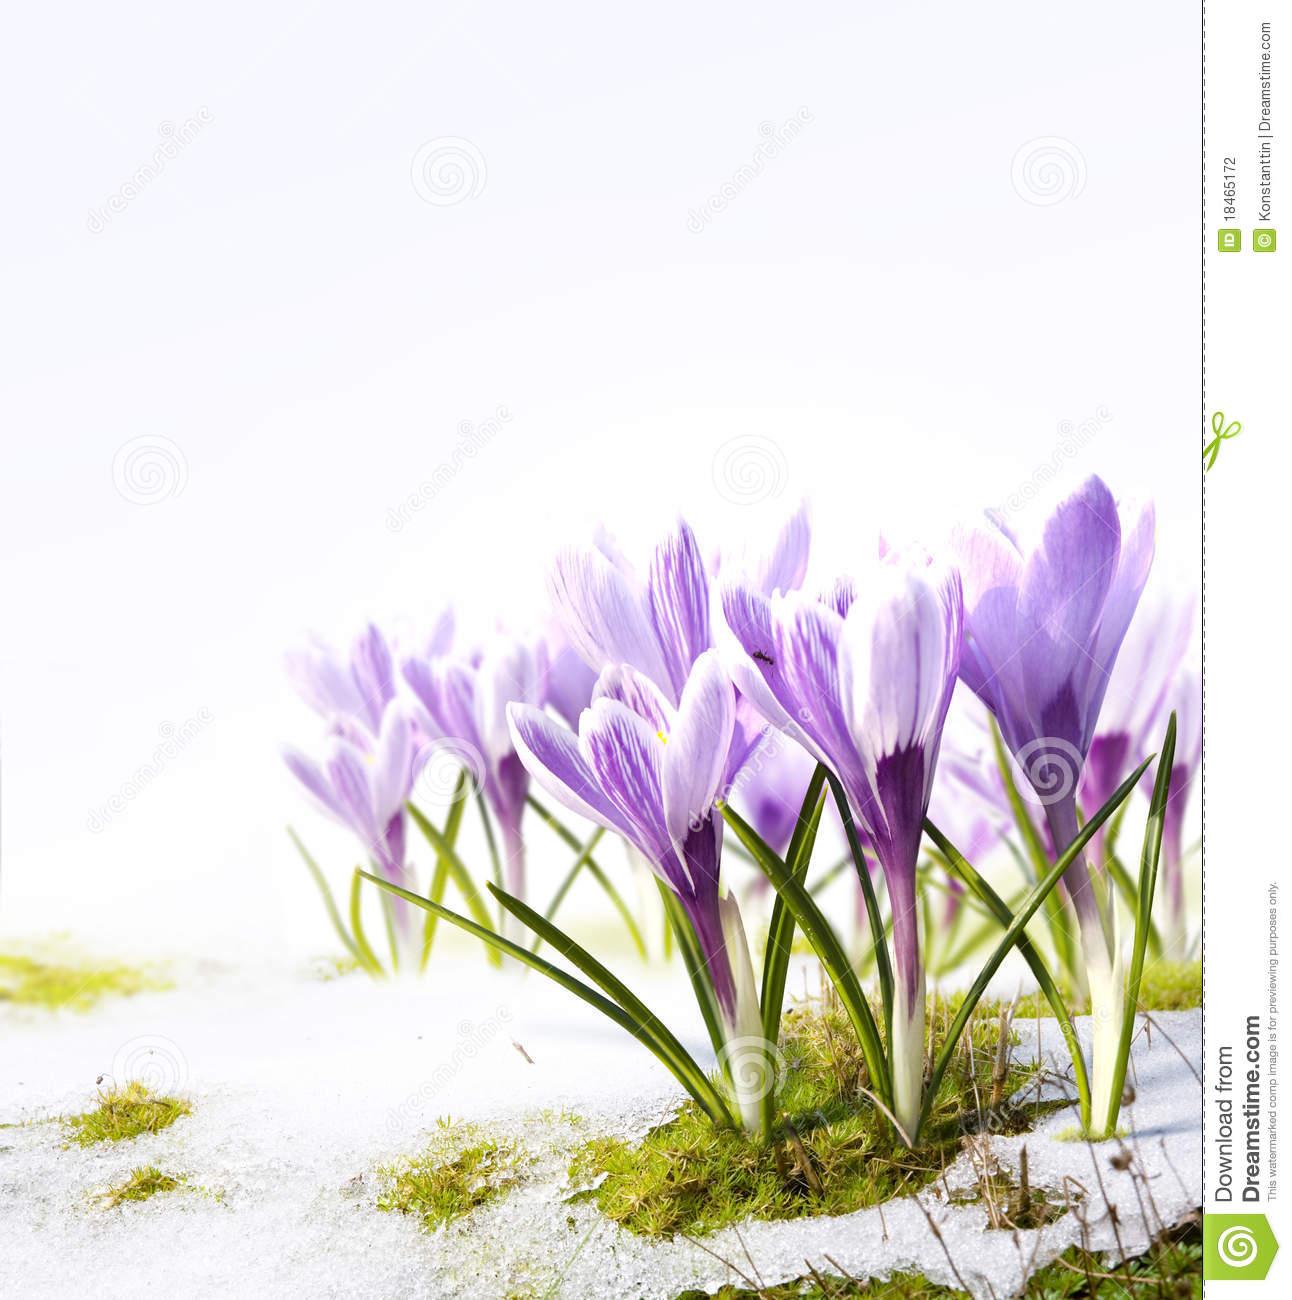 Winter melting into spring clipart vector black and white Spring clip art snow - 15 clip arts for free download on EEN vector black and white